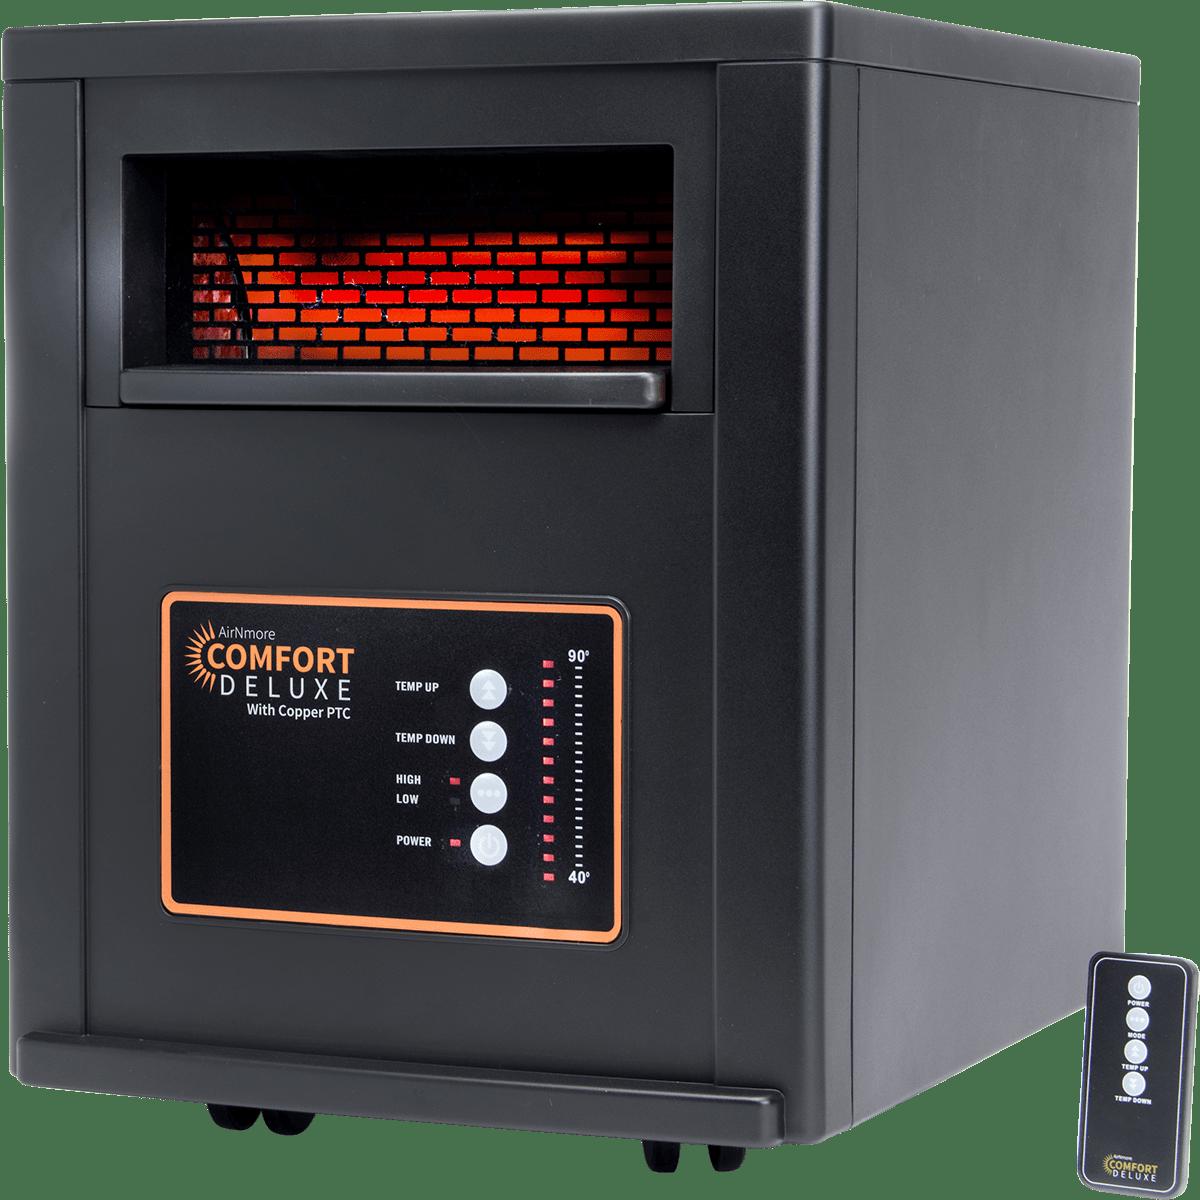 AirNmore Comfort Deluxe Infrared Space Heater Model: YD-903G-CDA